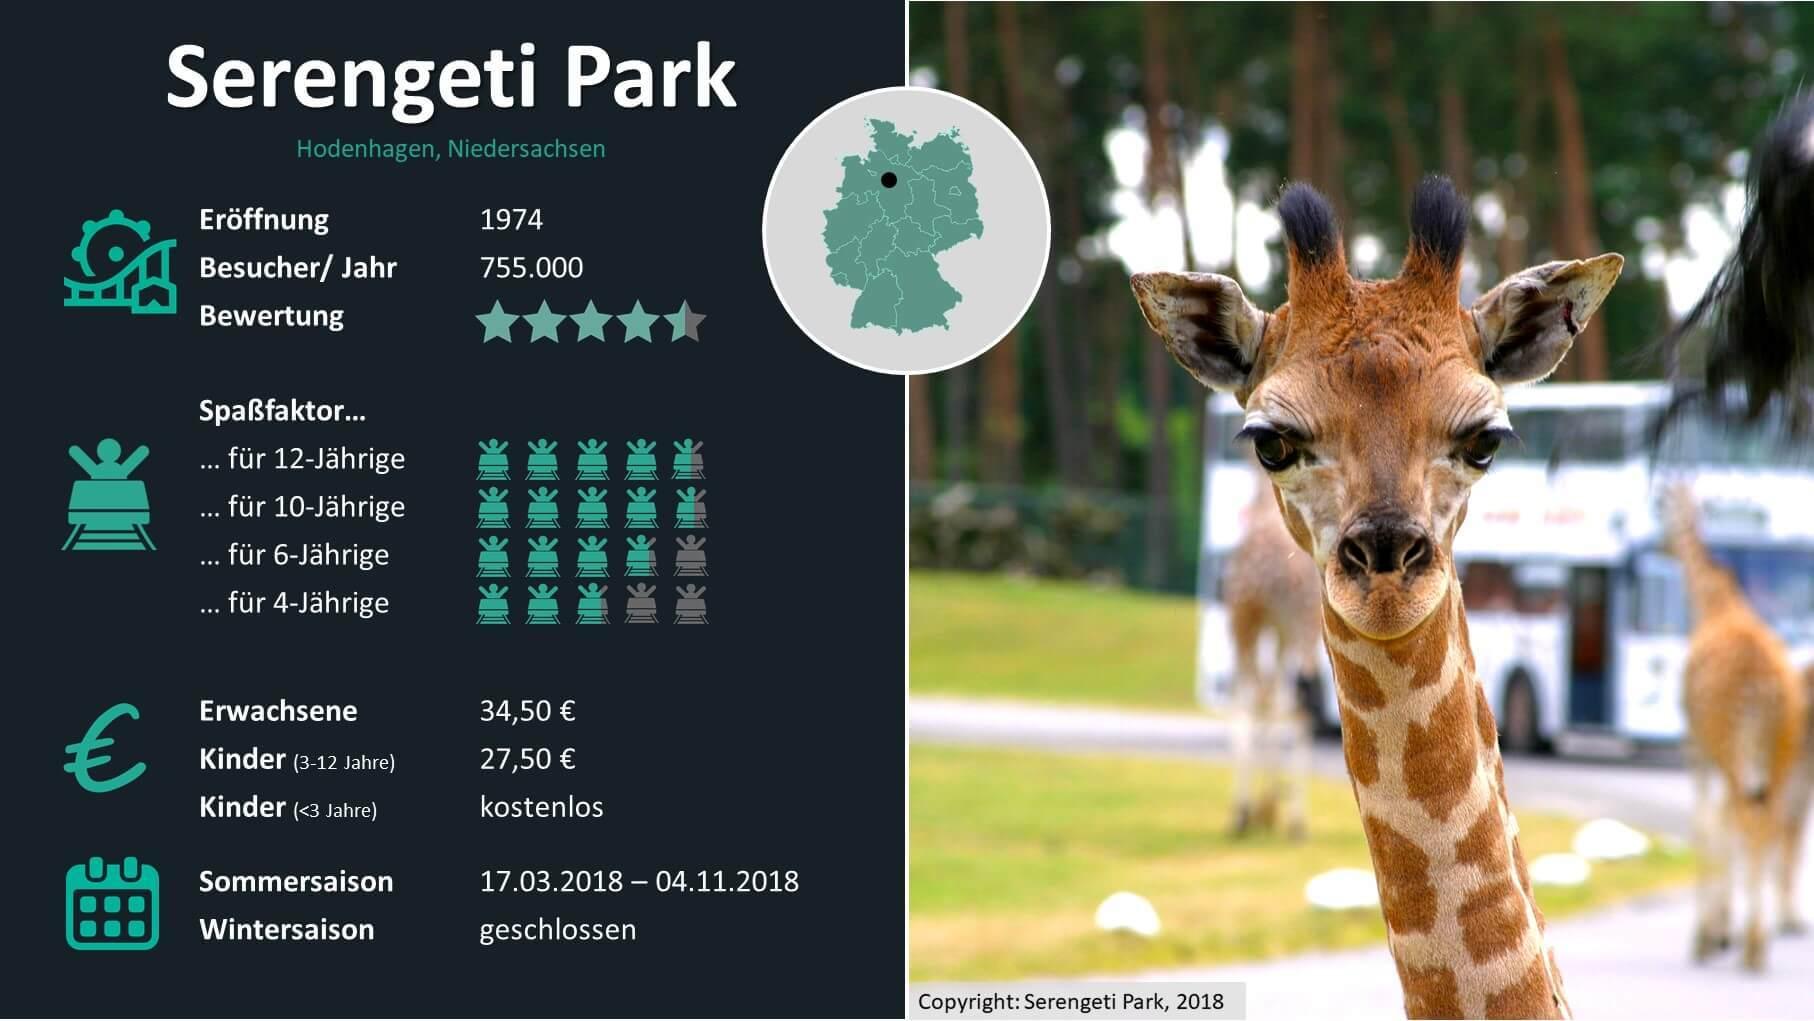 Freizeitpark Check: Serengeti Park